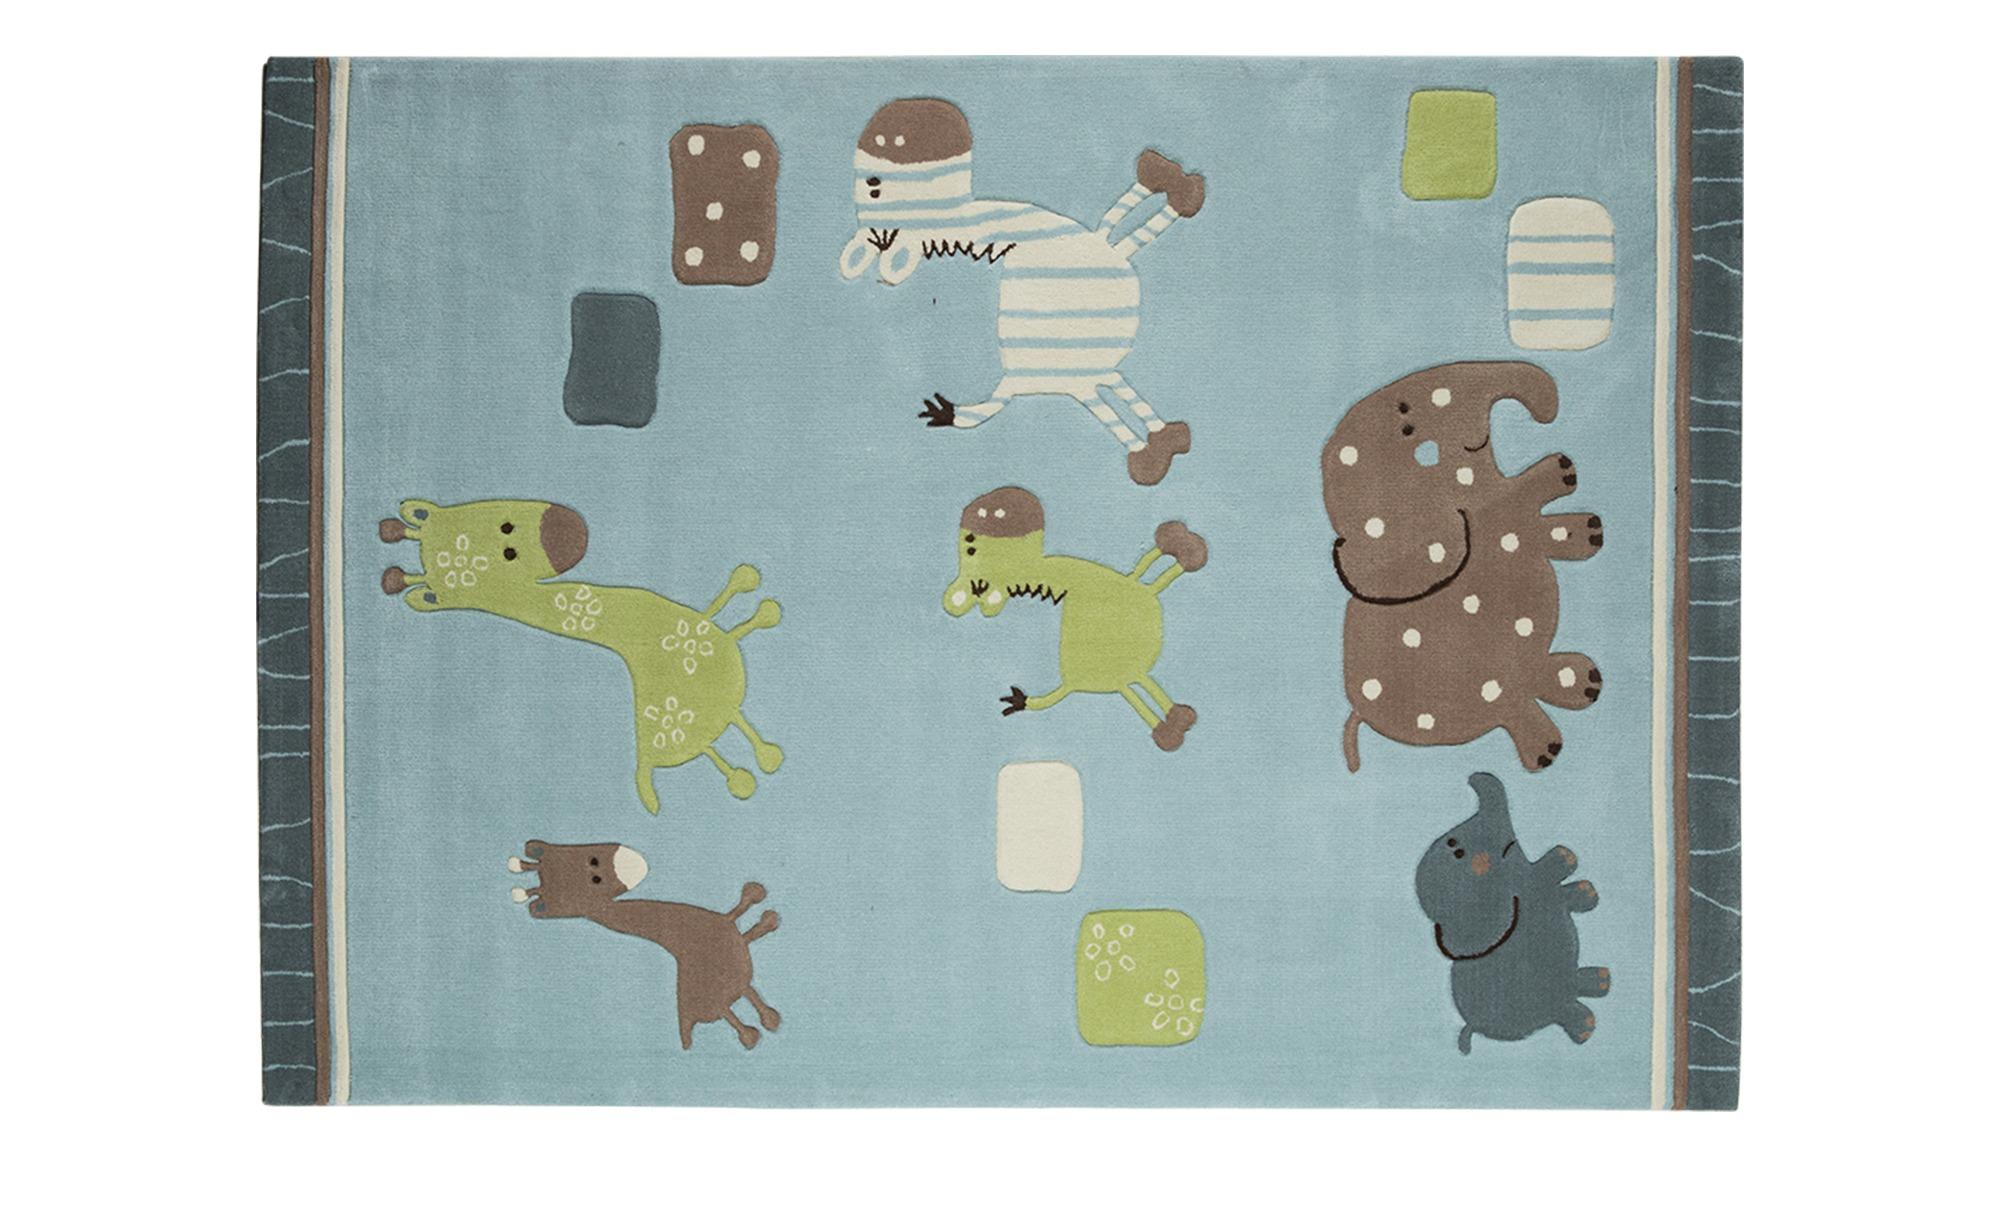 esprit handtuft teppich lucky zoo breite 90 cm h he blau. Black Bedroom Furniture Sets. Home Design Ideas